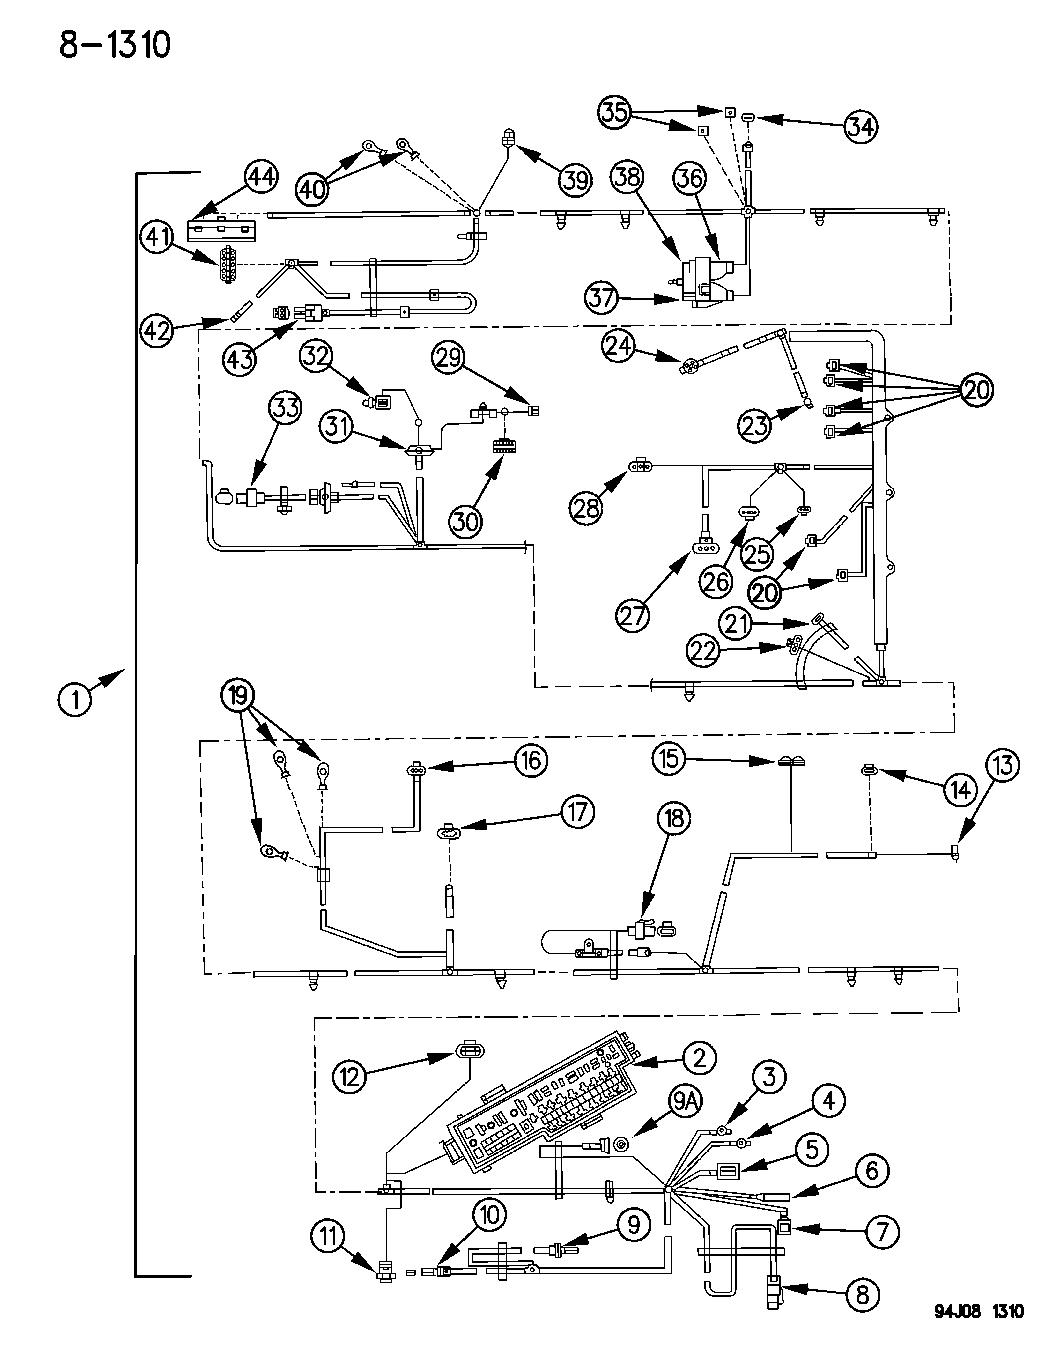 1995 jeep cherokee wiring headlamp to dash mopar parts. Black Bedroom Furniture Sets. Home Design Ideas